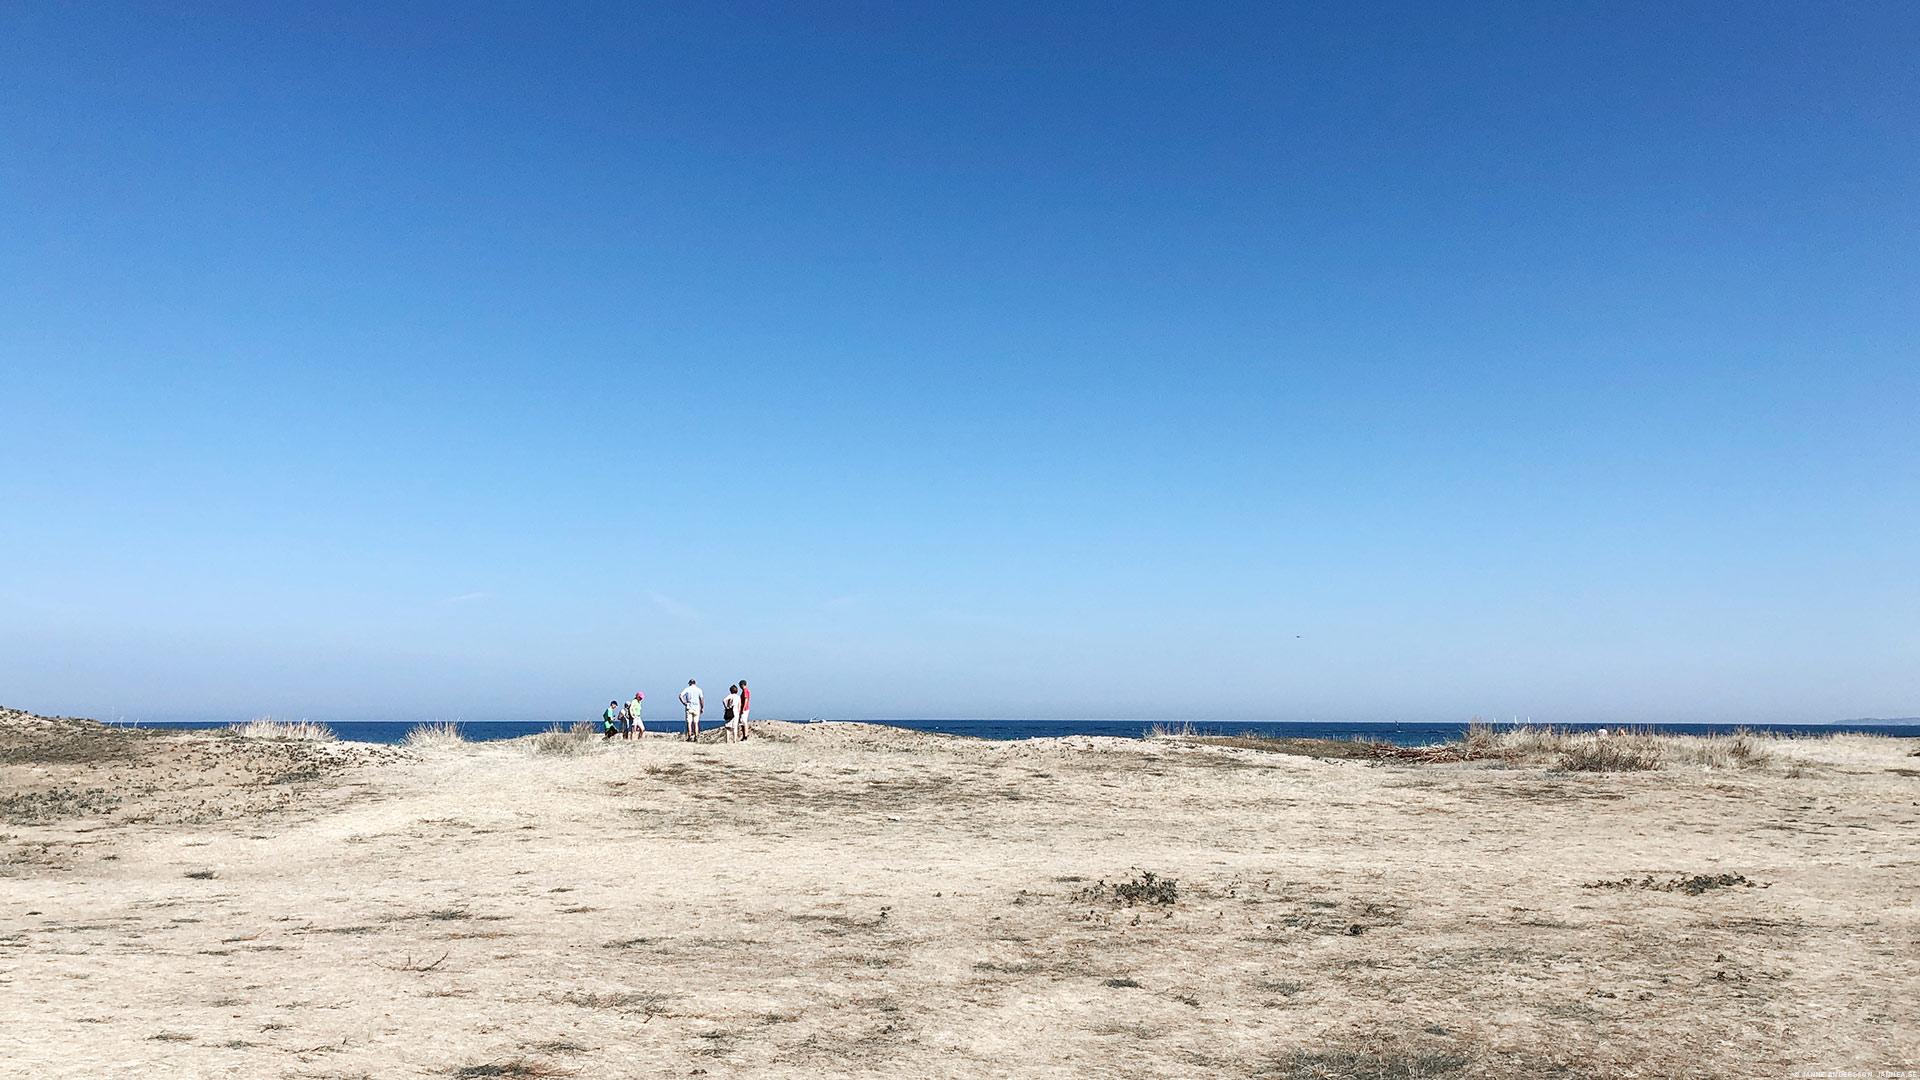 Beach life (Gilleleje strand) |© Janne A